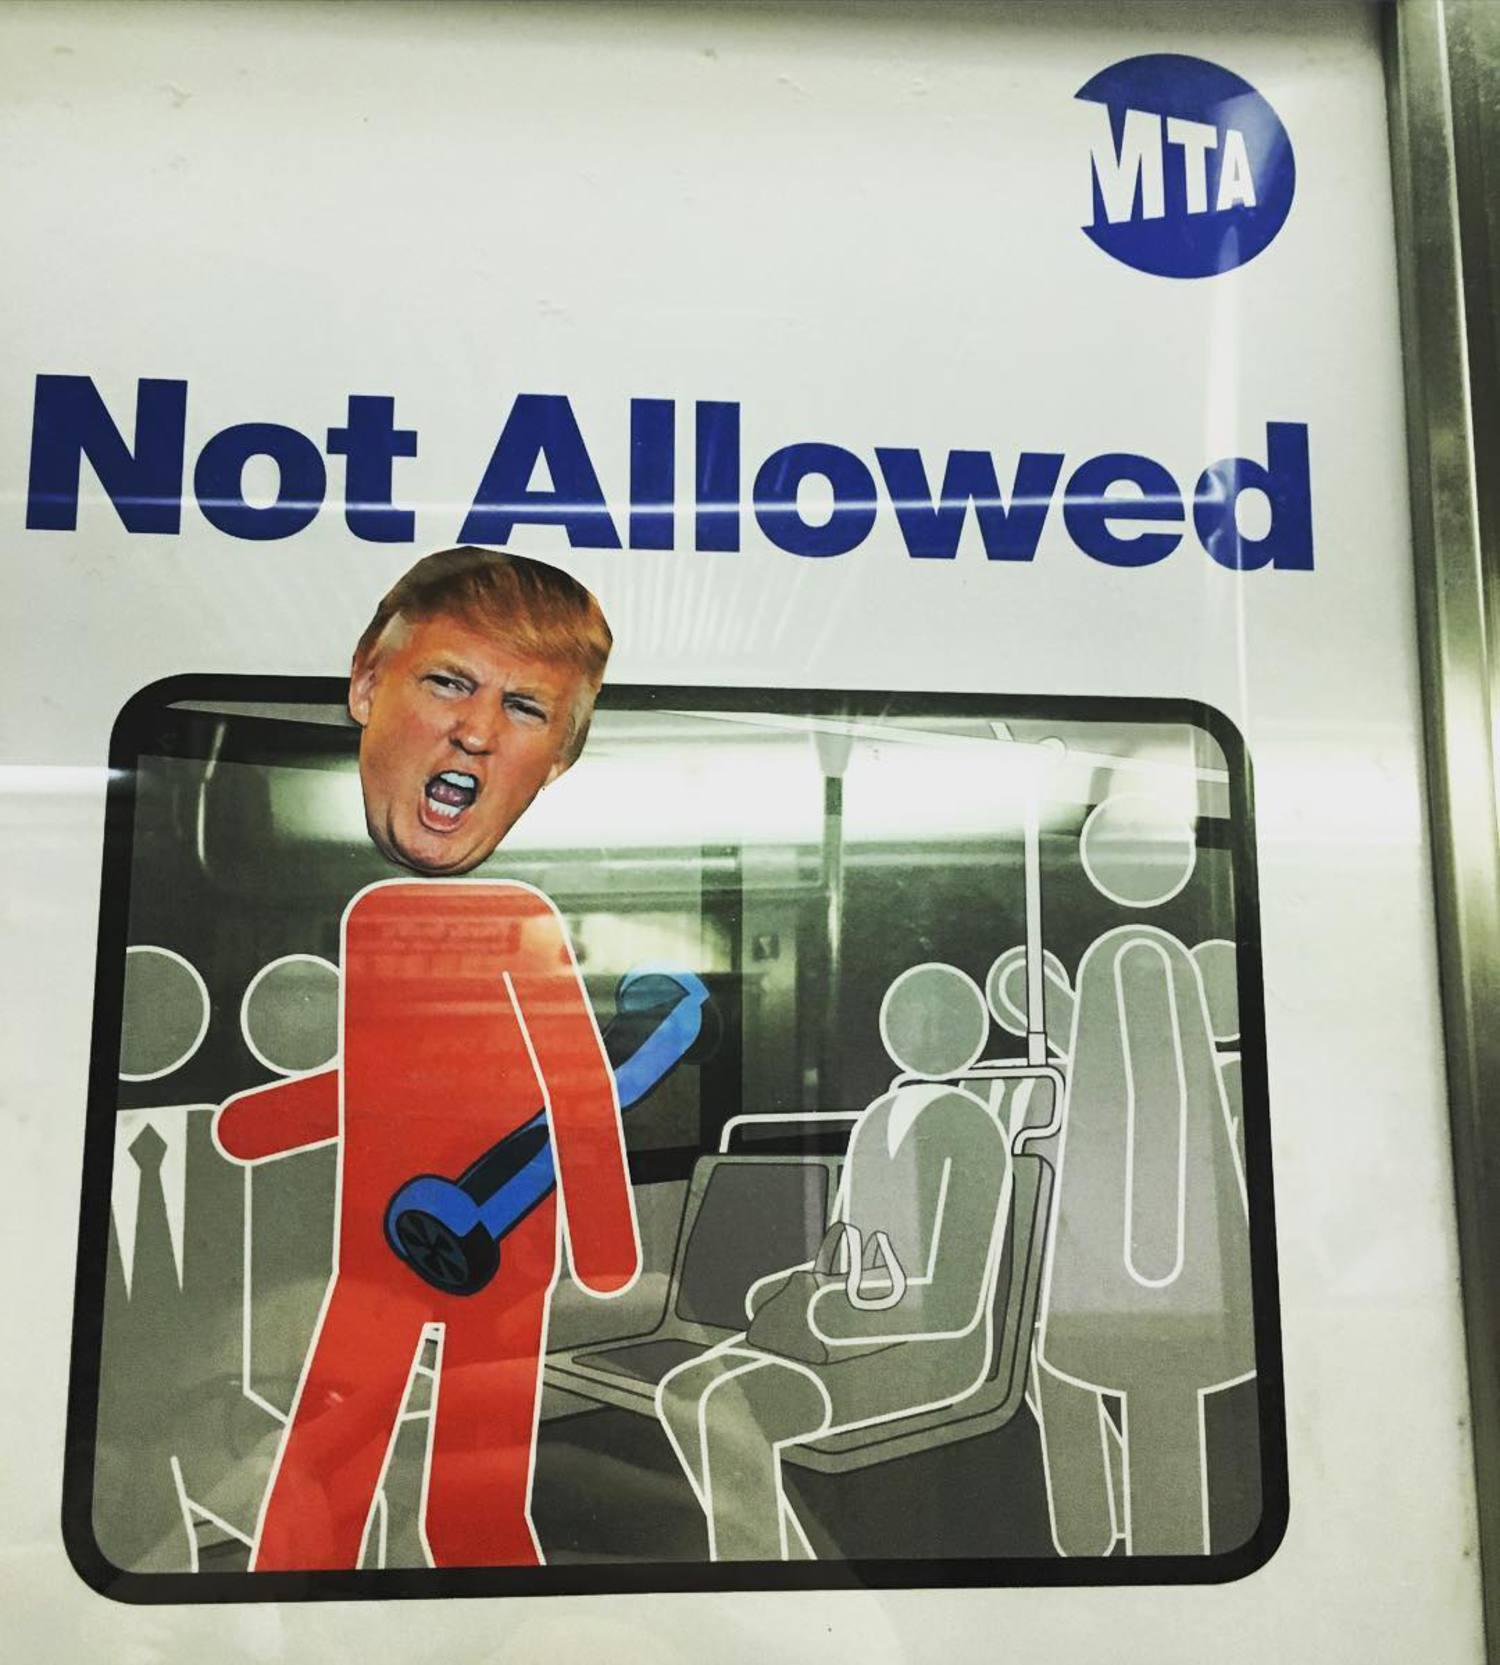 #NYC #newyork #subway #newyorkcity #streetart #gofuckyourself #donaldtrump #makeamericagreatagain #mta #sexgun #drugs @gothamist @gawker @huffingtonpost @foxnews @msnbc